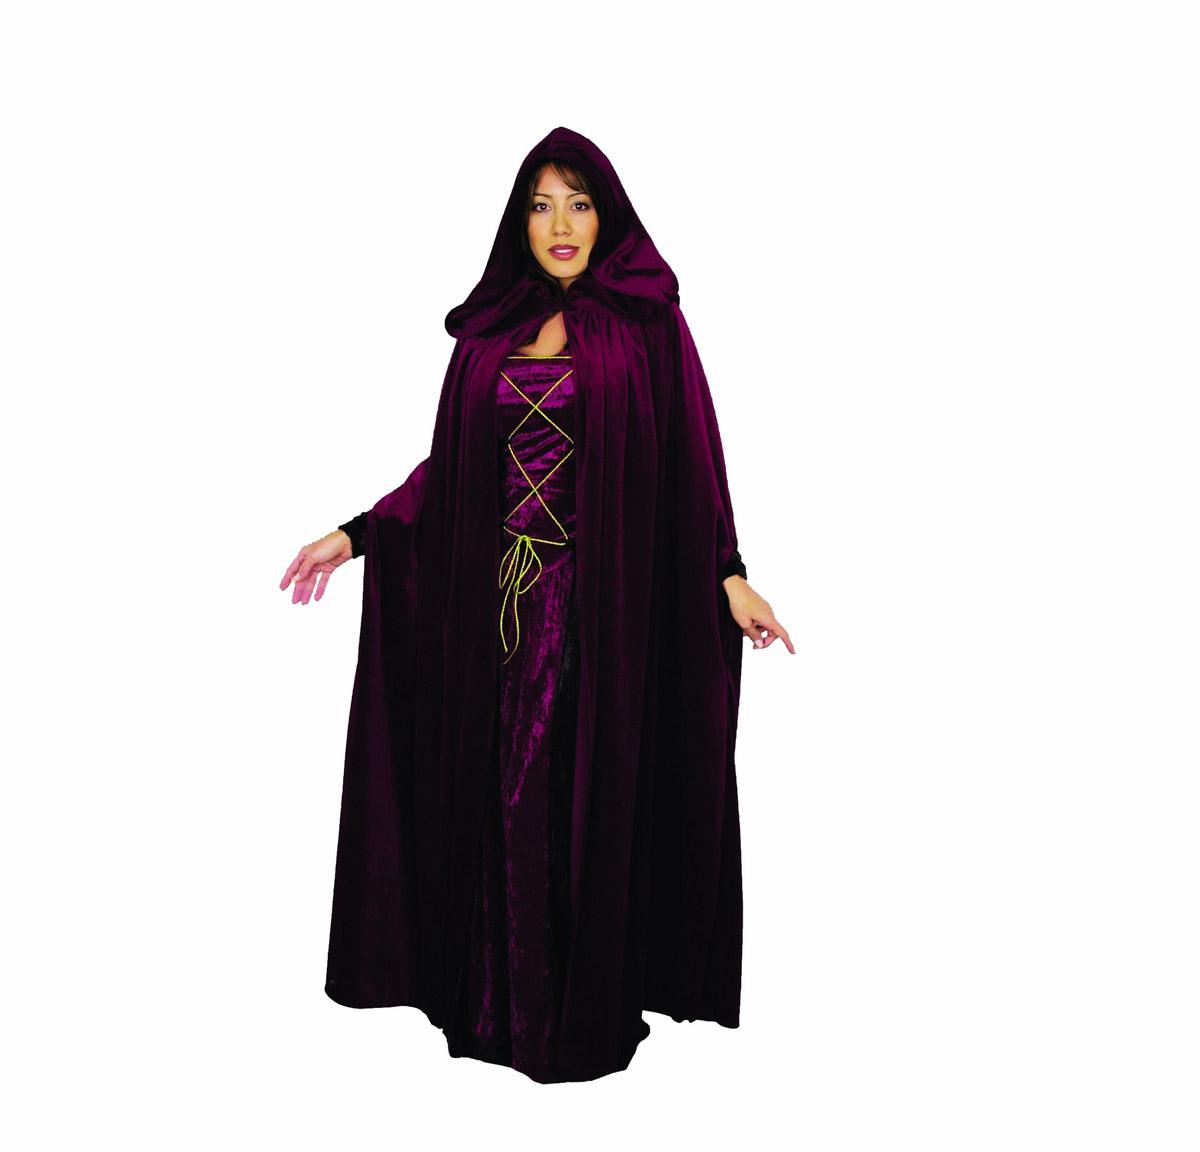 dark lair velvet cloak halloween costume witch cape